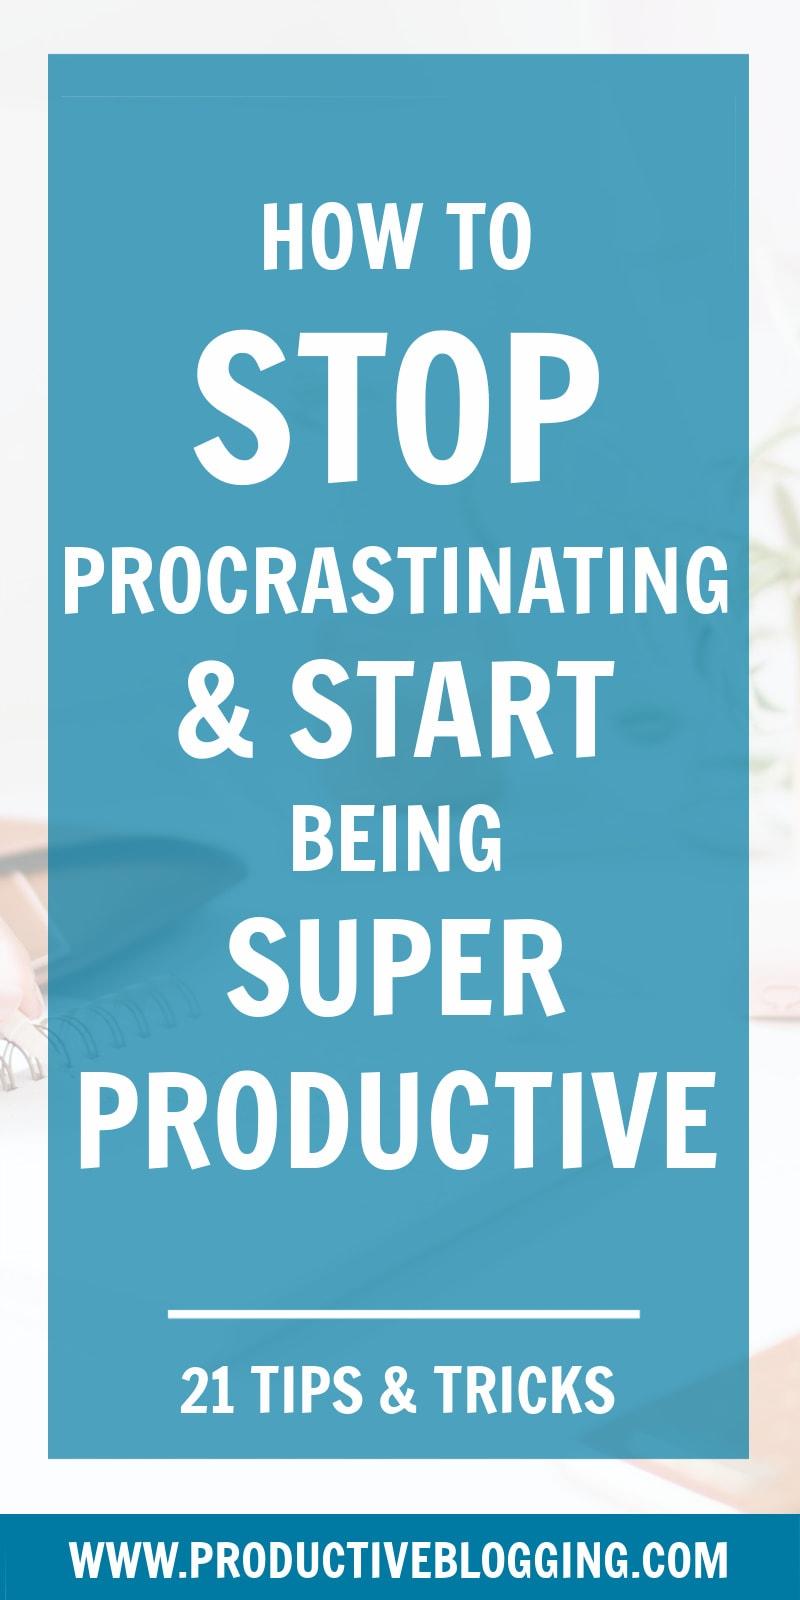 Procrastination is a huge stumbling block to success. Here's how to overcome procrastination and start being super productive… #procrastination #beatprocrastination #productivity #productivitytips #productivityhacks #todolist #goals #planning #timemanagement #organized #organizedblogger #efficiency #goals #blogginggoals #blogger #bloggingtips #blogtips #bloggersofIG #professionalblogger #bloggingismyjob #solopreneur #mompreneur #fempreneur #bloggingbiz #productiveblogging #blogsmarternotharder